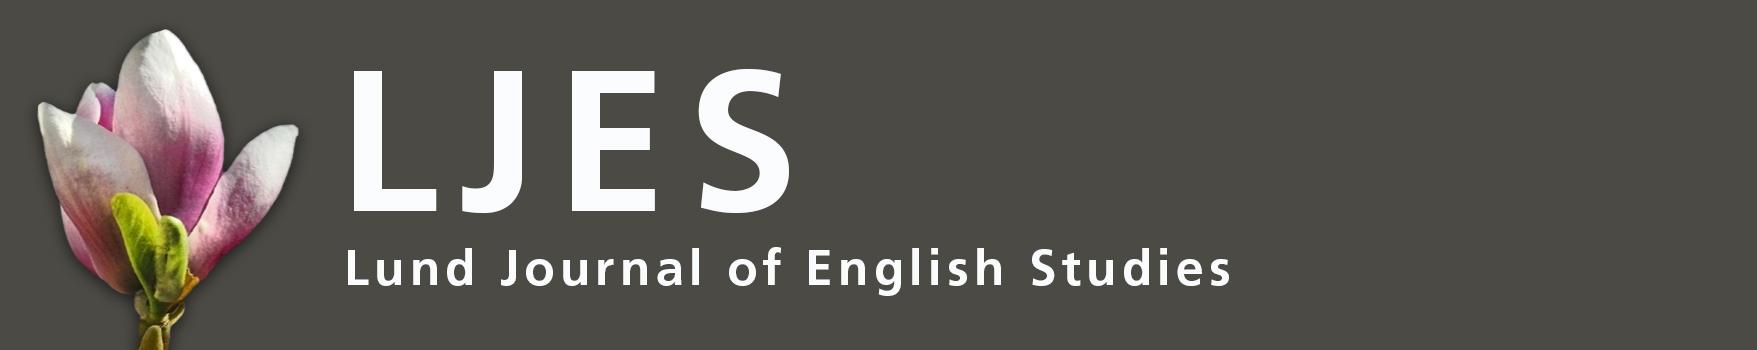 Lund Journal of English Studies